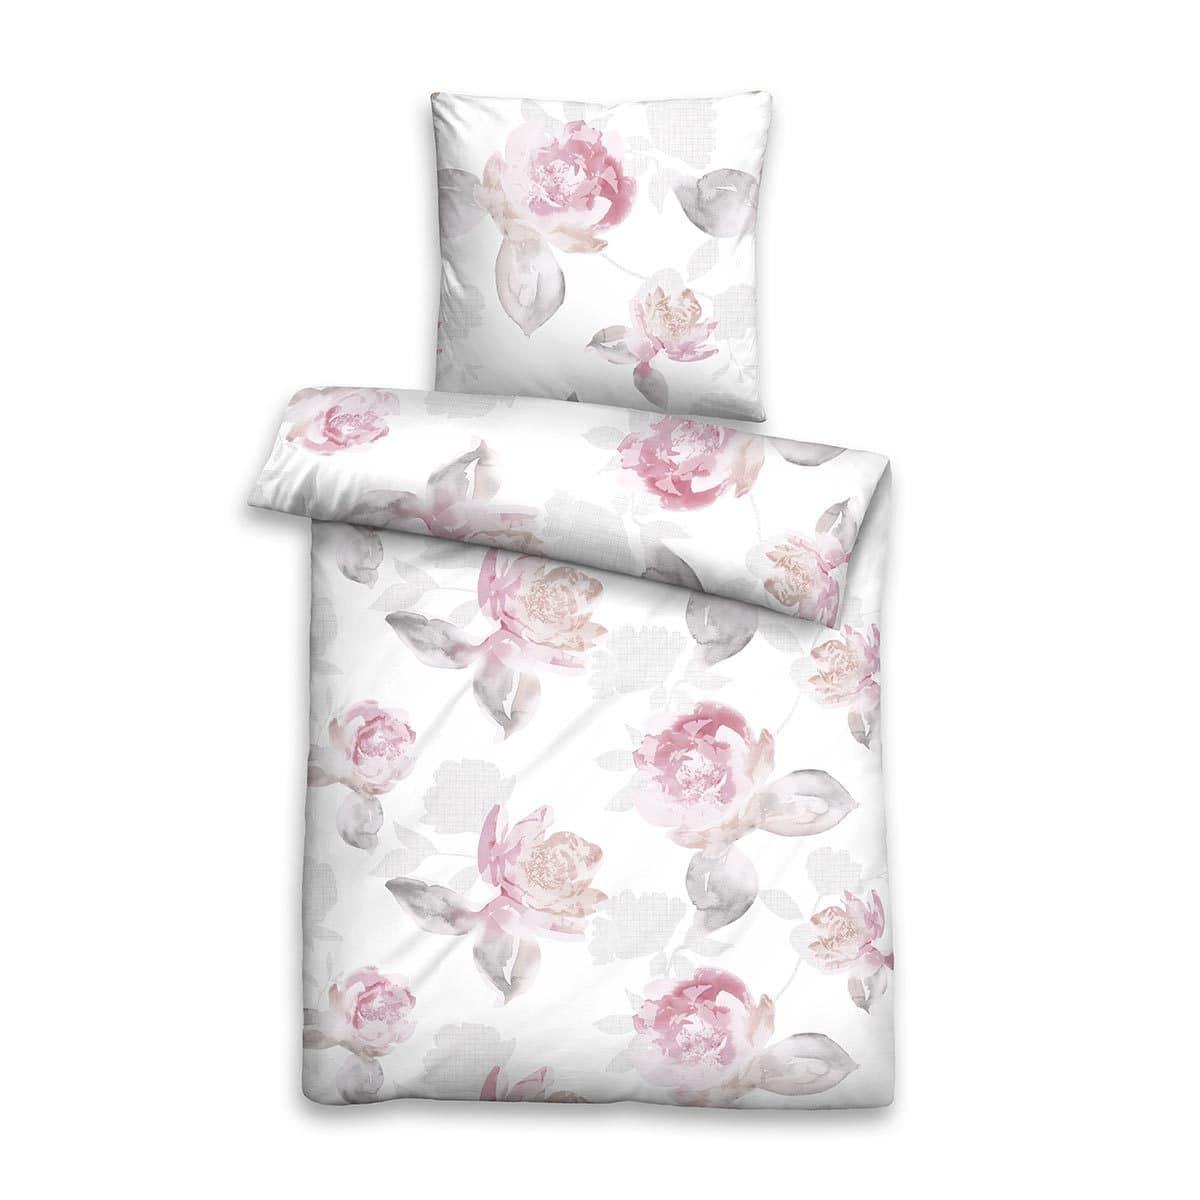 biberna edelflanell bettw sche 84245 537 g nstig online kaufen bei bettwaren shop. Black Bedroom Furniture Sets. Home Design Ideas